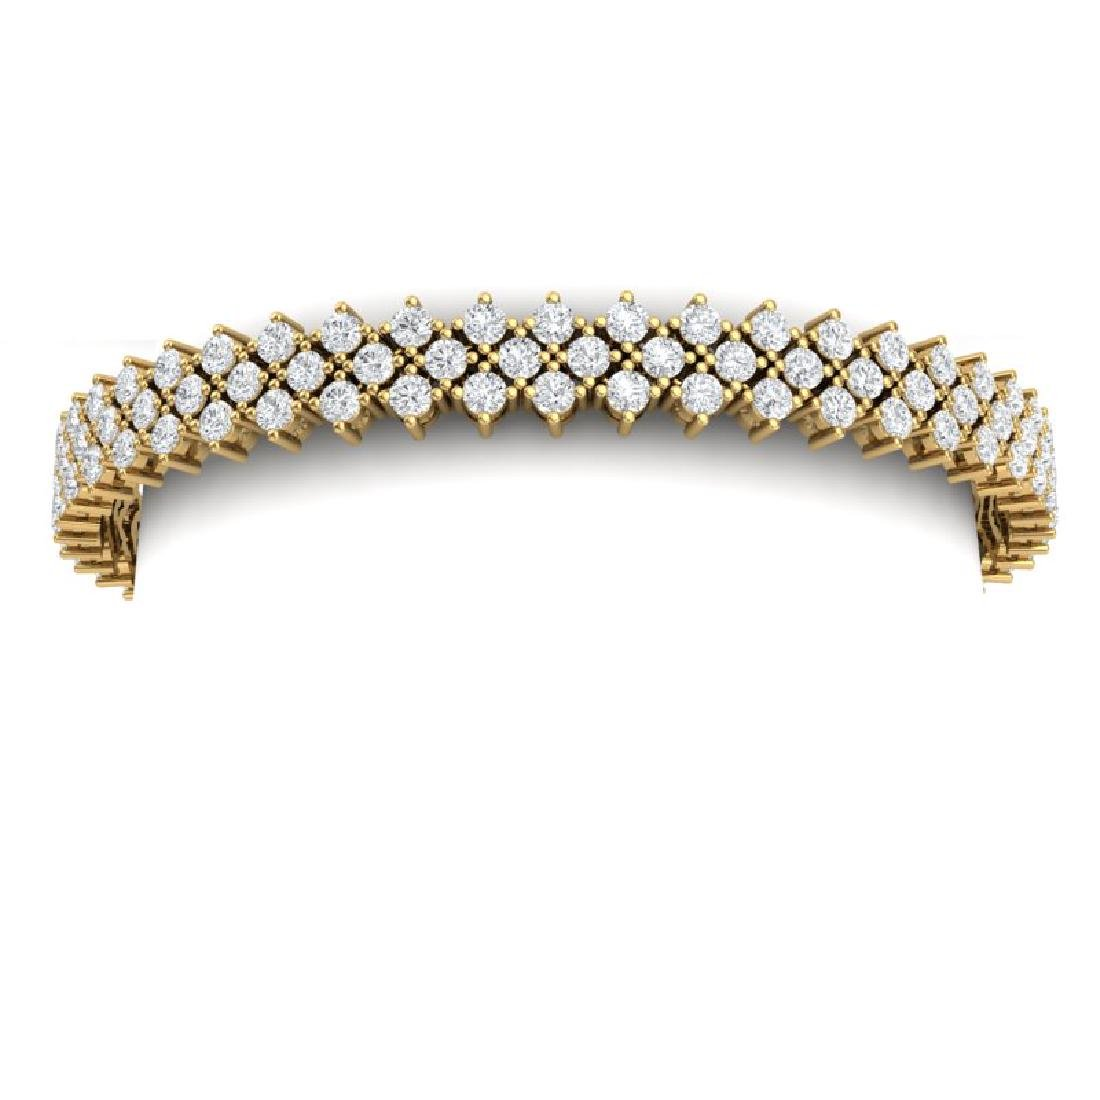 10 CTW Certified SI/I Diamond Bracelet 18K Yellow Gold - 2